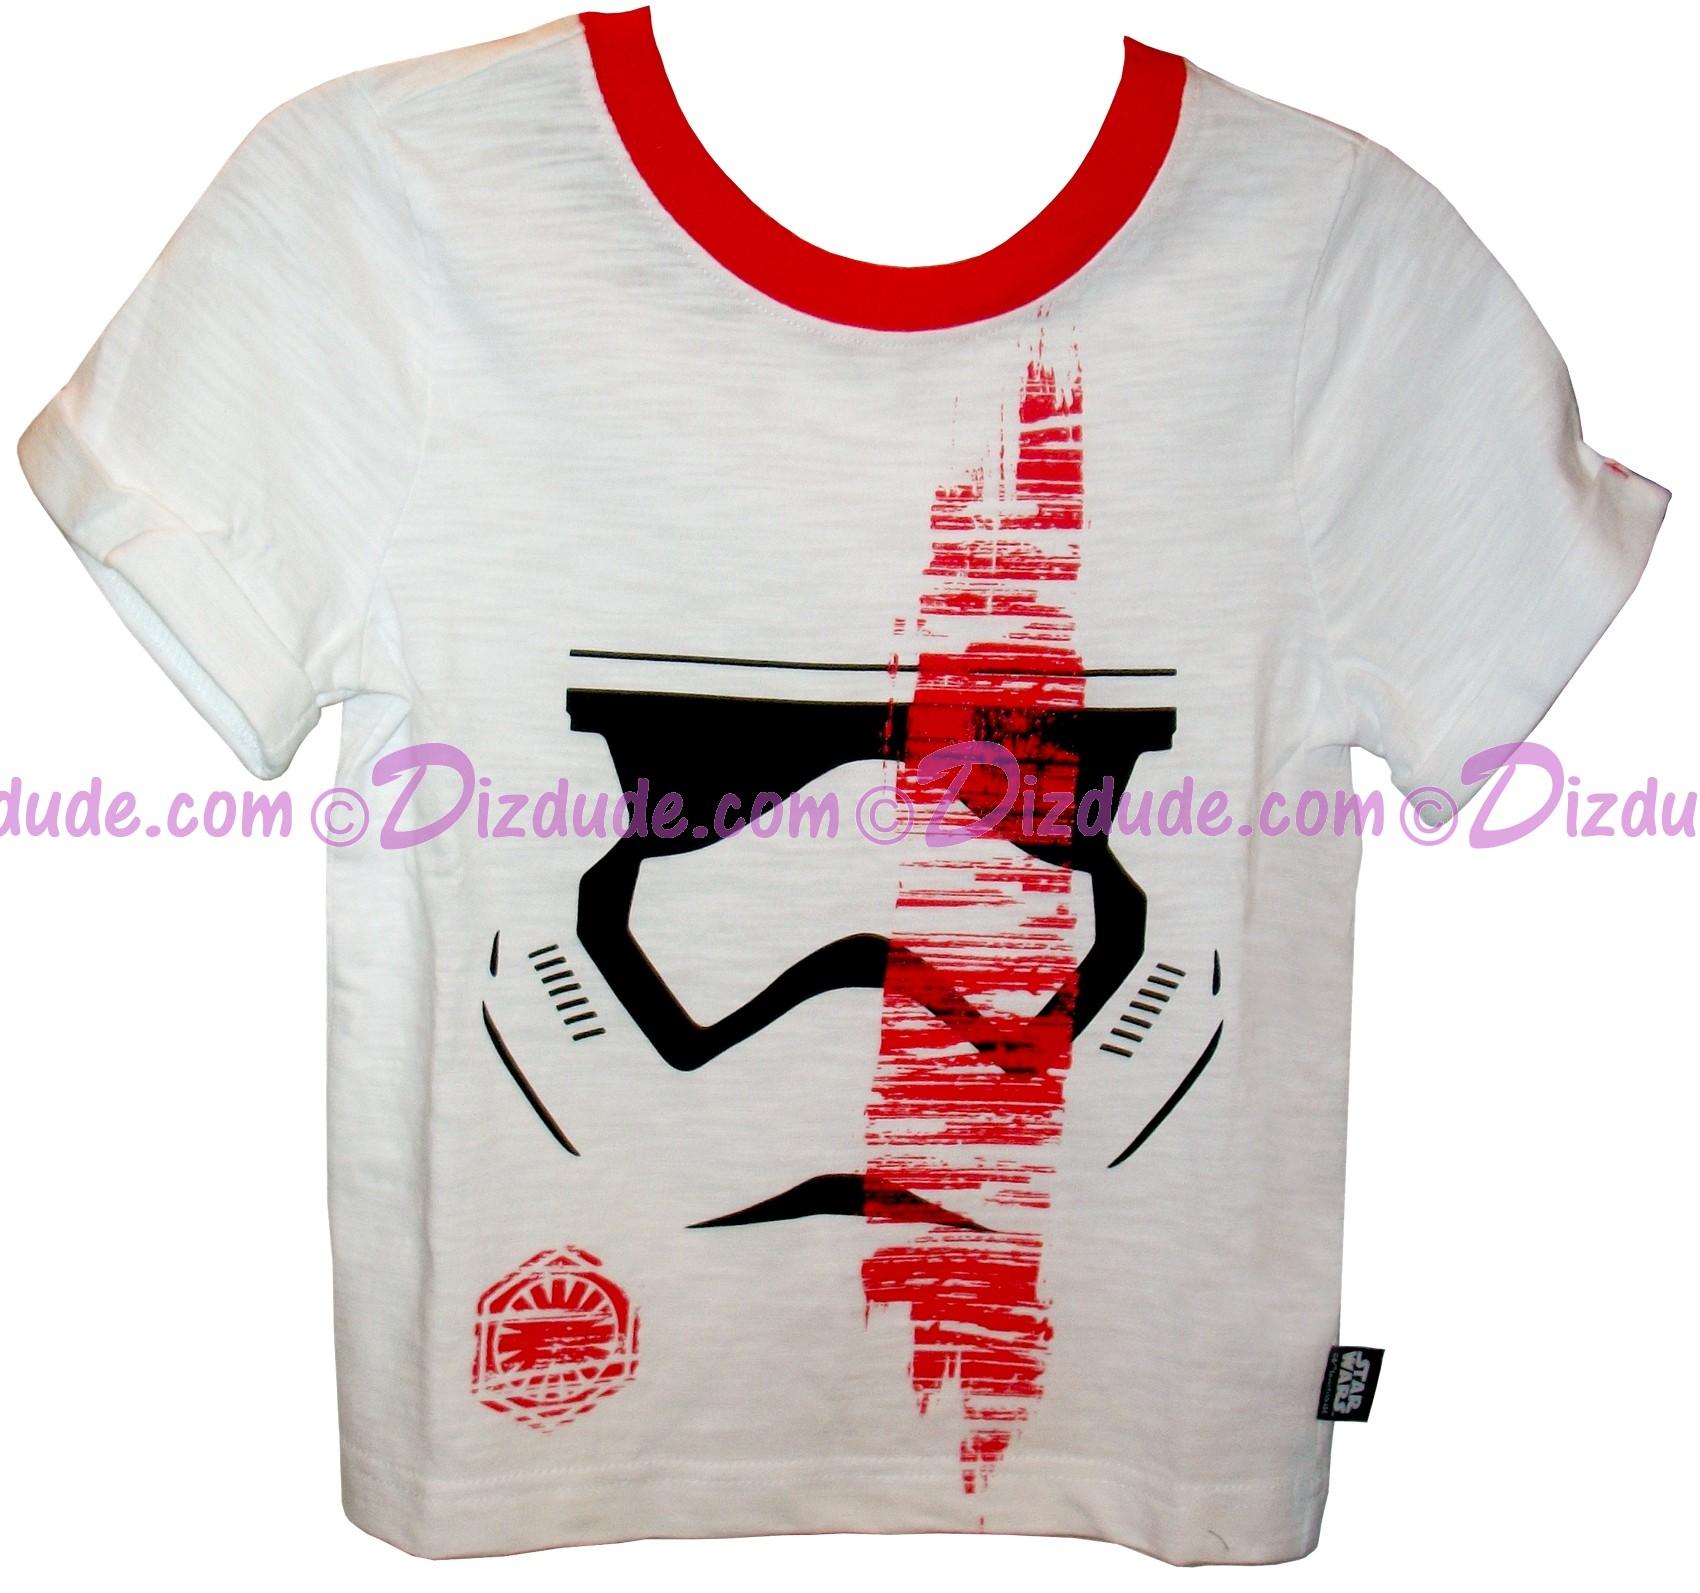 First Order Stormtrooper Youth T-Shirt (Tshirt, T shirt or Tee) - Disney Star Wars Episode VIII: The Last Jedi © Dizdude.com